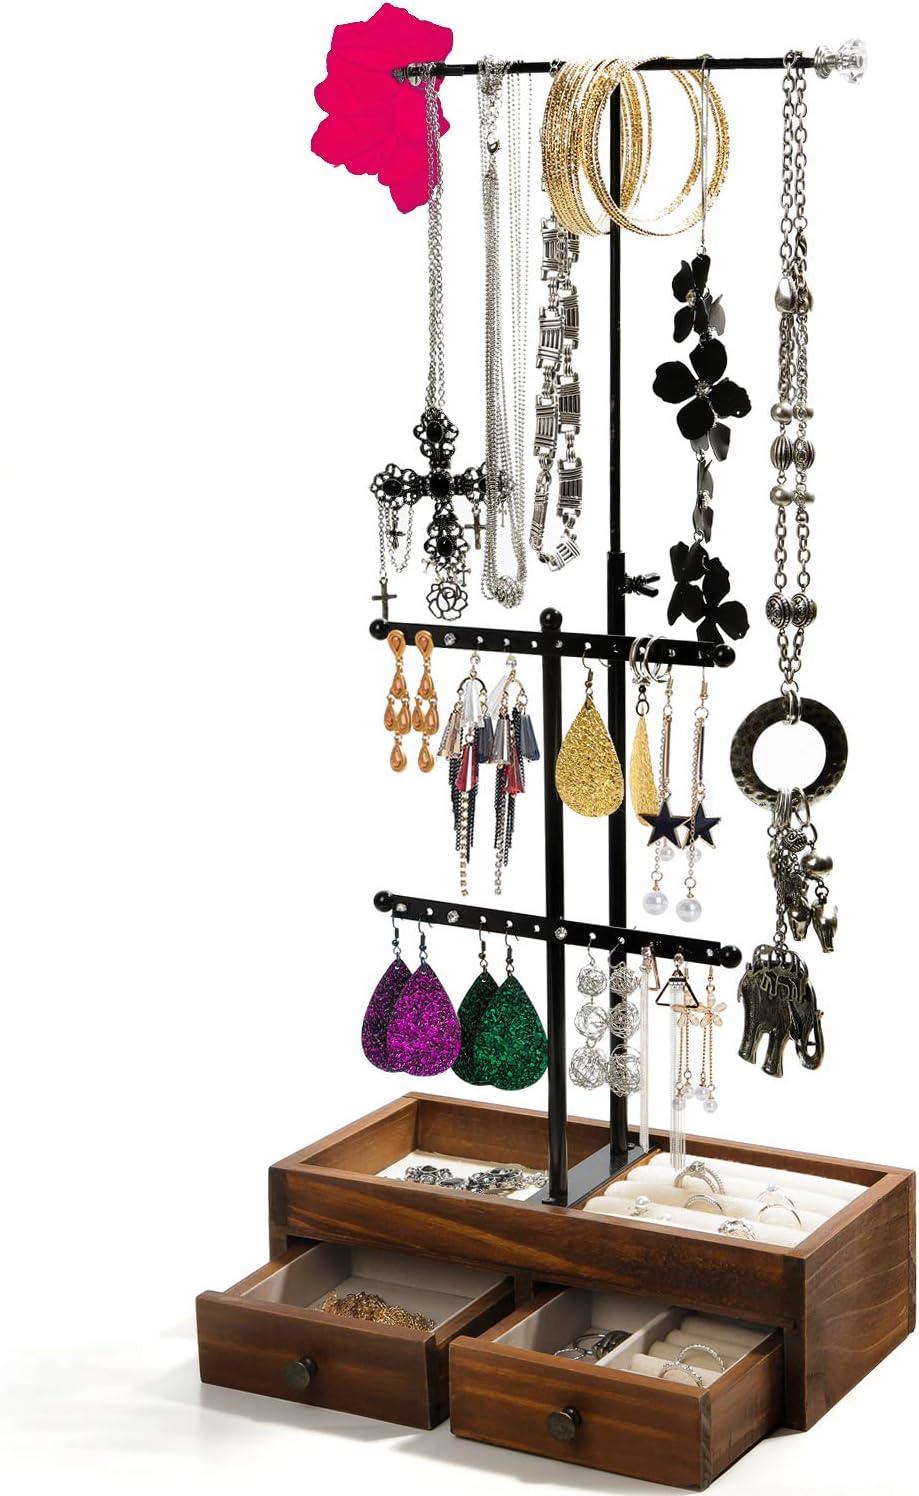 3 rows Black Large Handmade Bracelet HolderJewelry OrganizerWooden Jewelry Display StandBracelets Storage Holder Sold Out